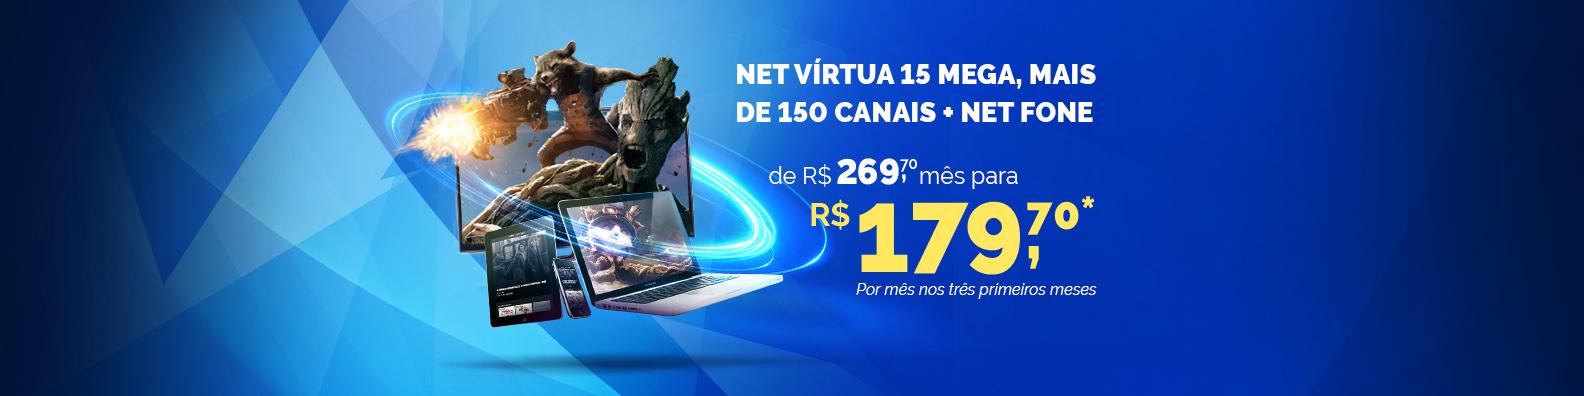 NET Combo 15 Mega